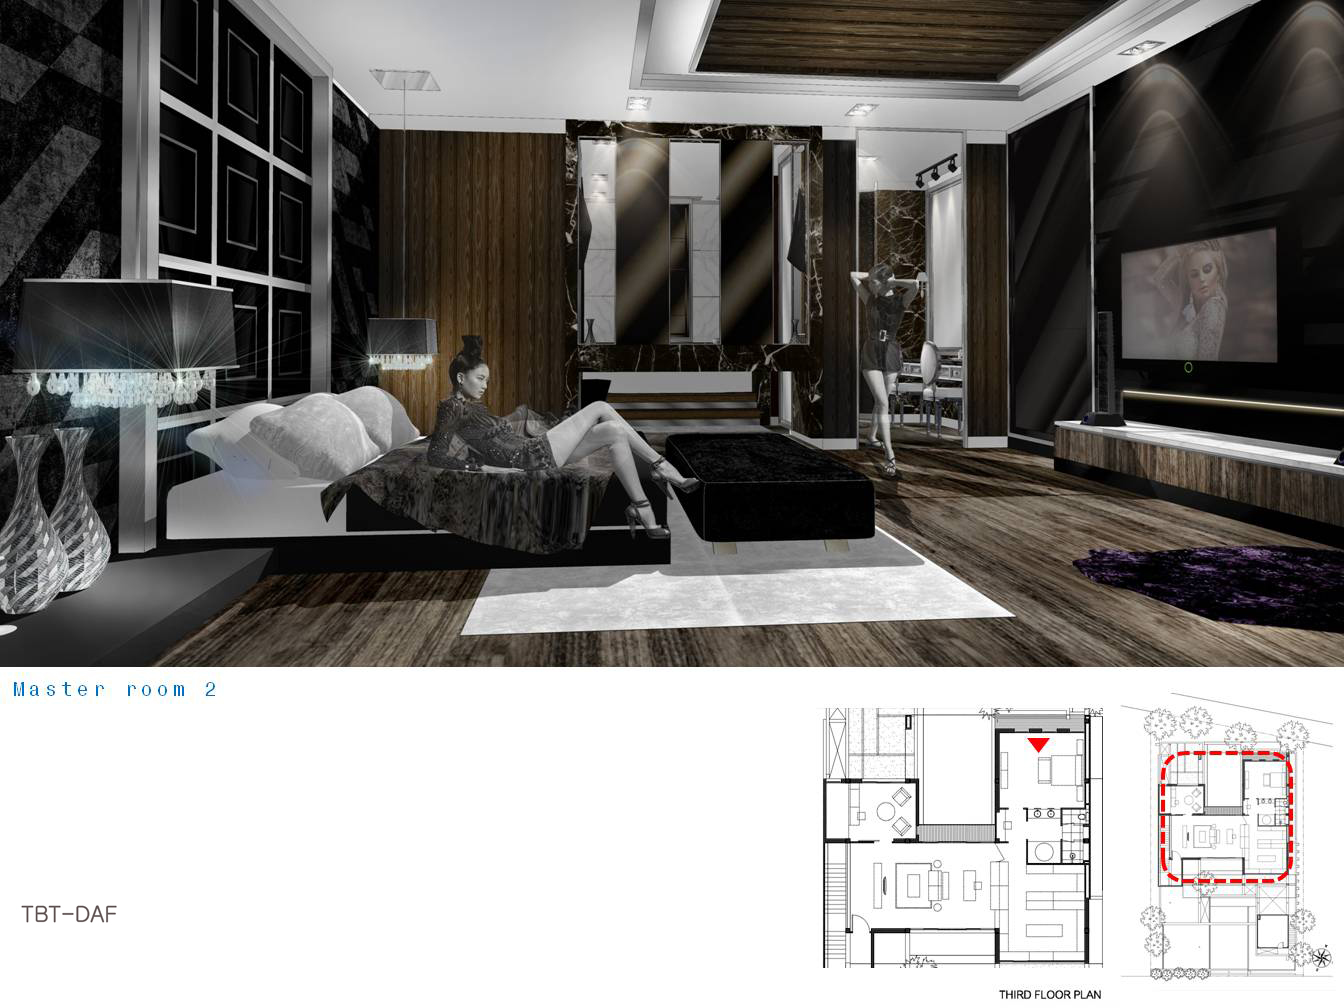 TBT-DAF interior design house robinson 30